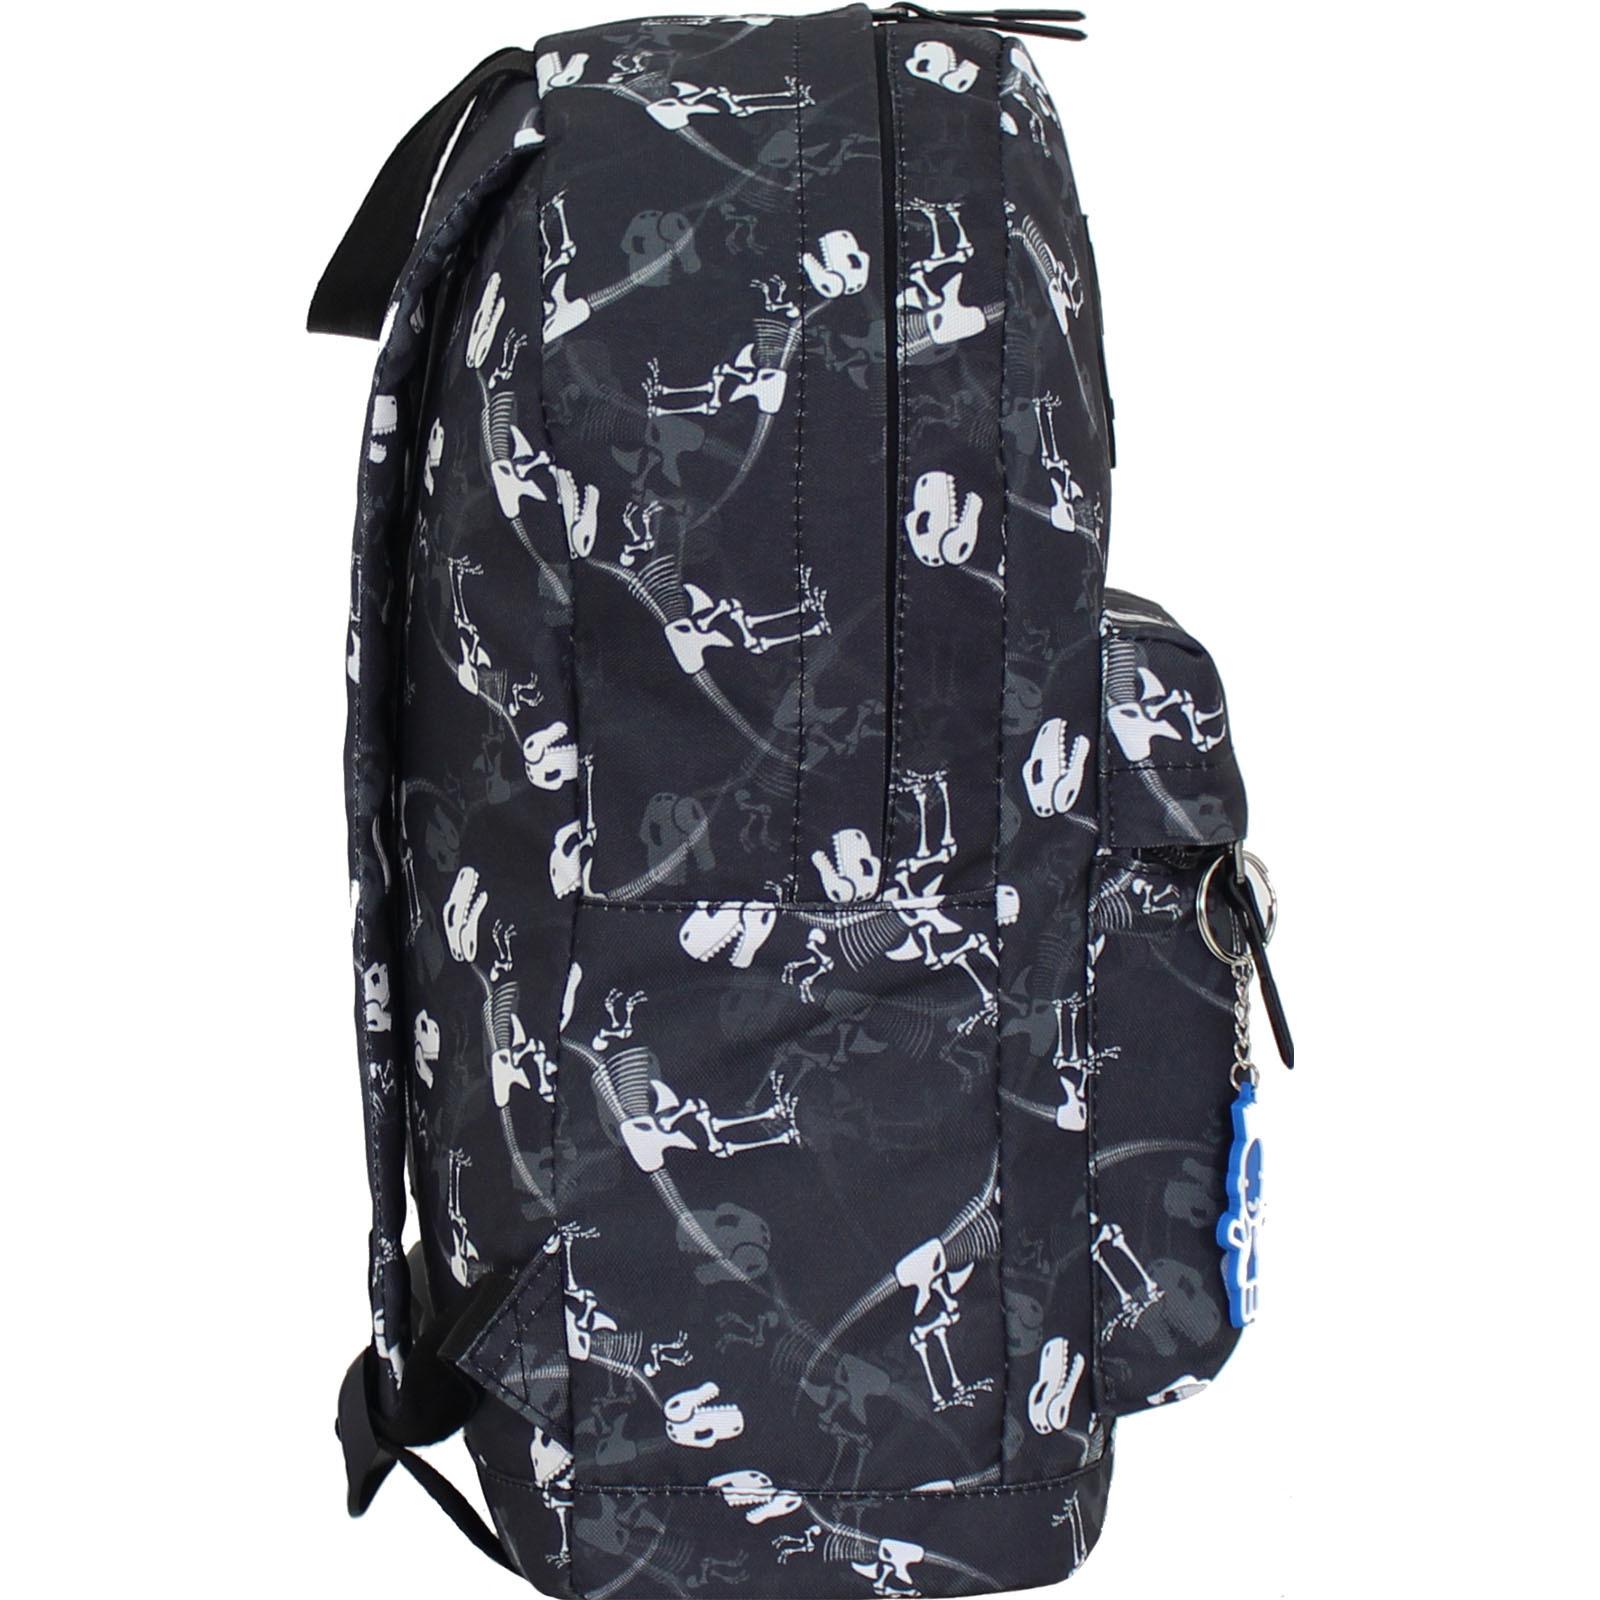 Рюкзак Bagland Молодежный (дизайн) 17 л. сублимация 245 (00533664)